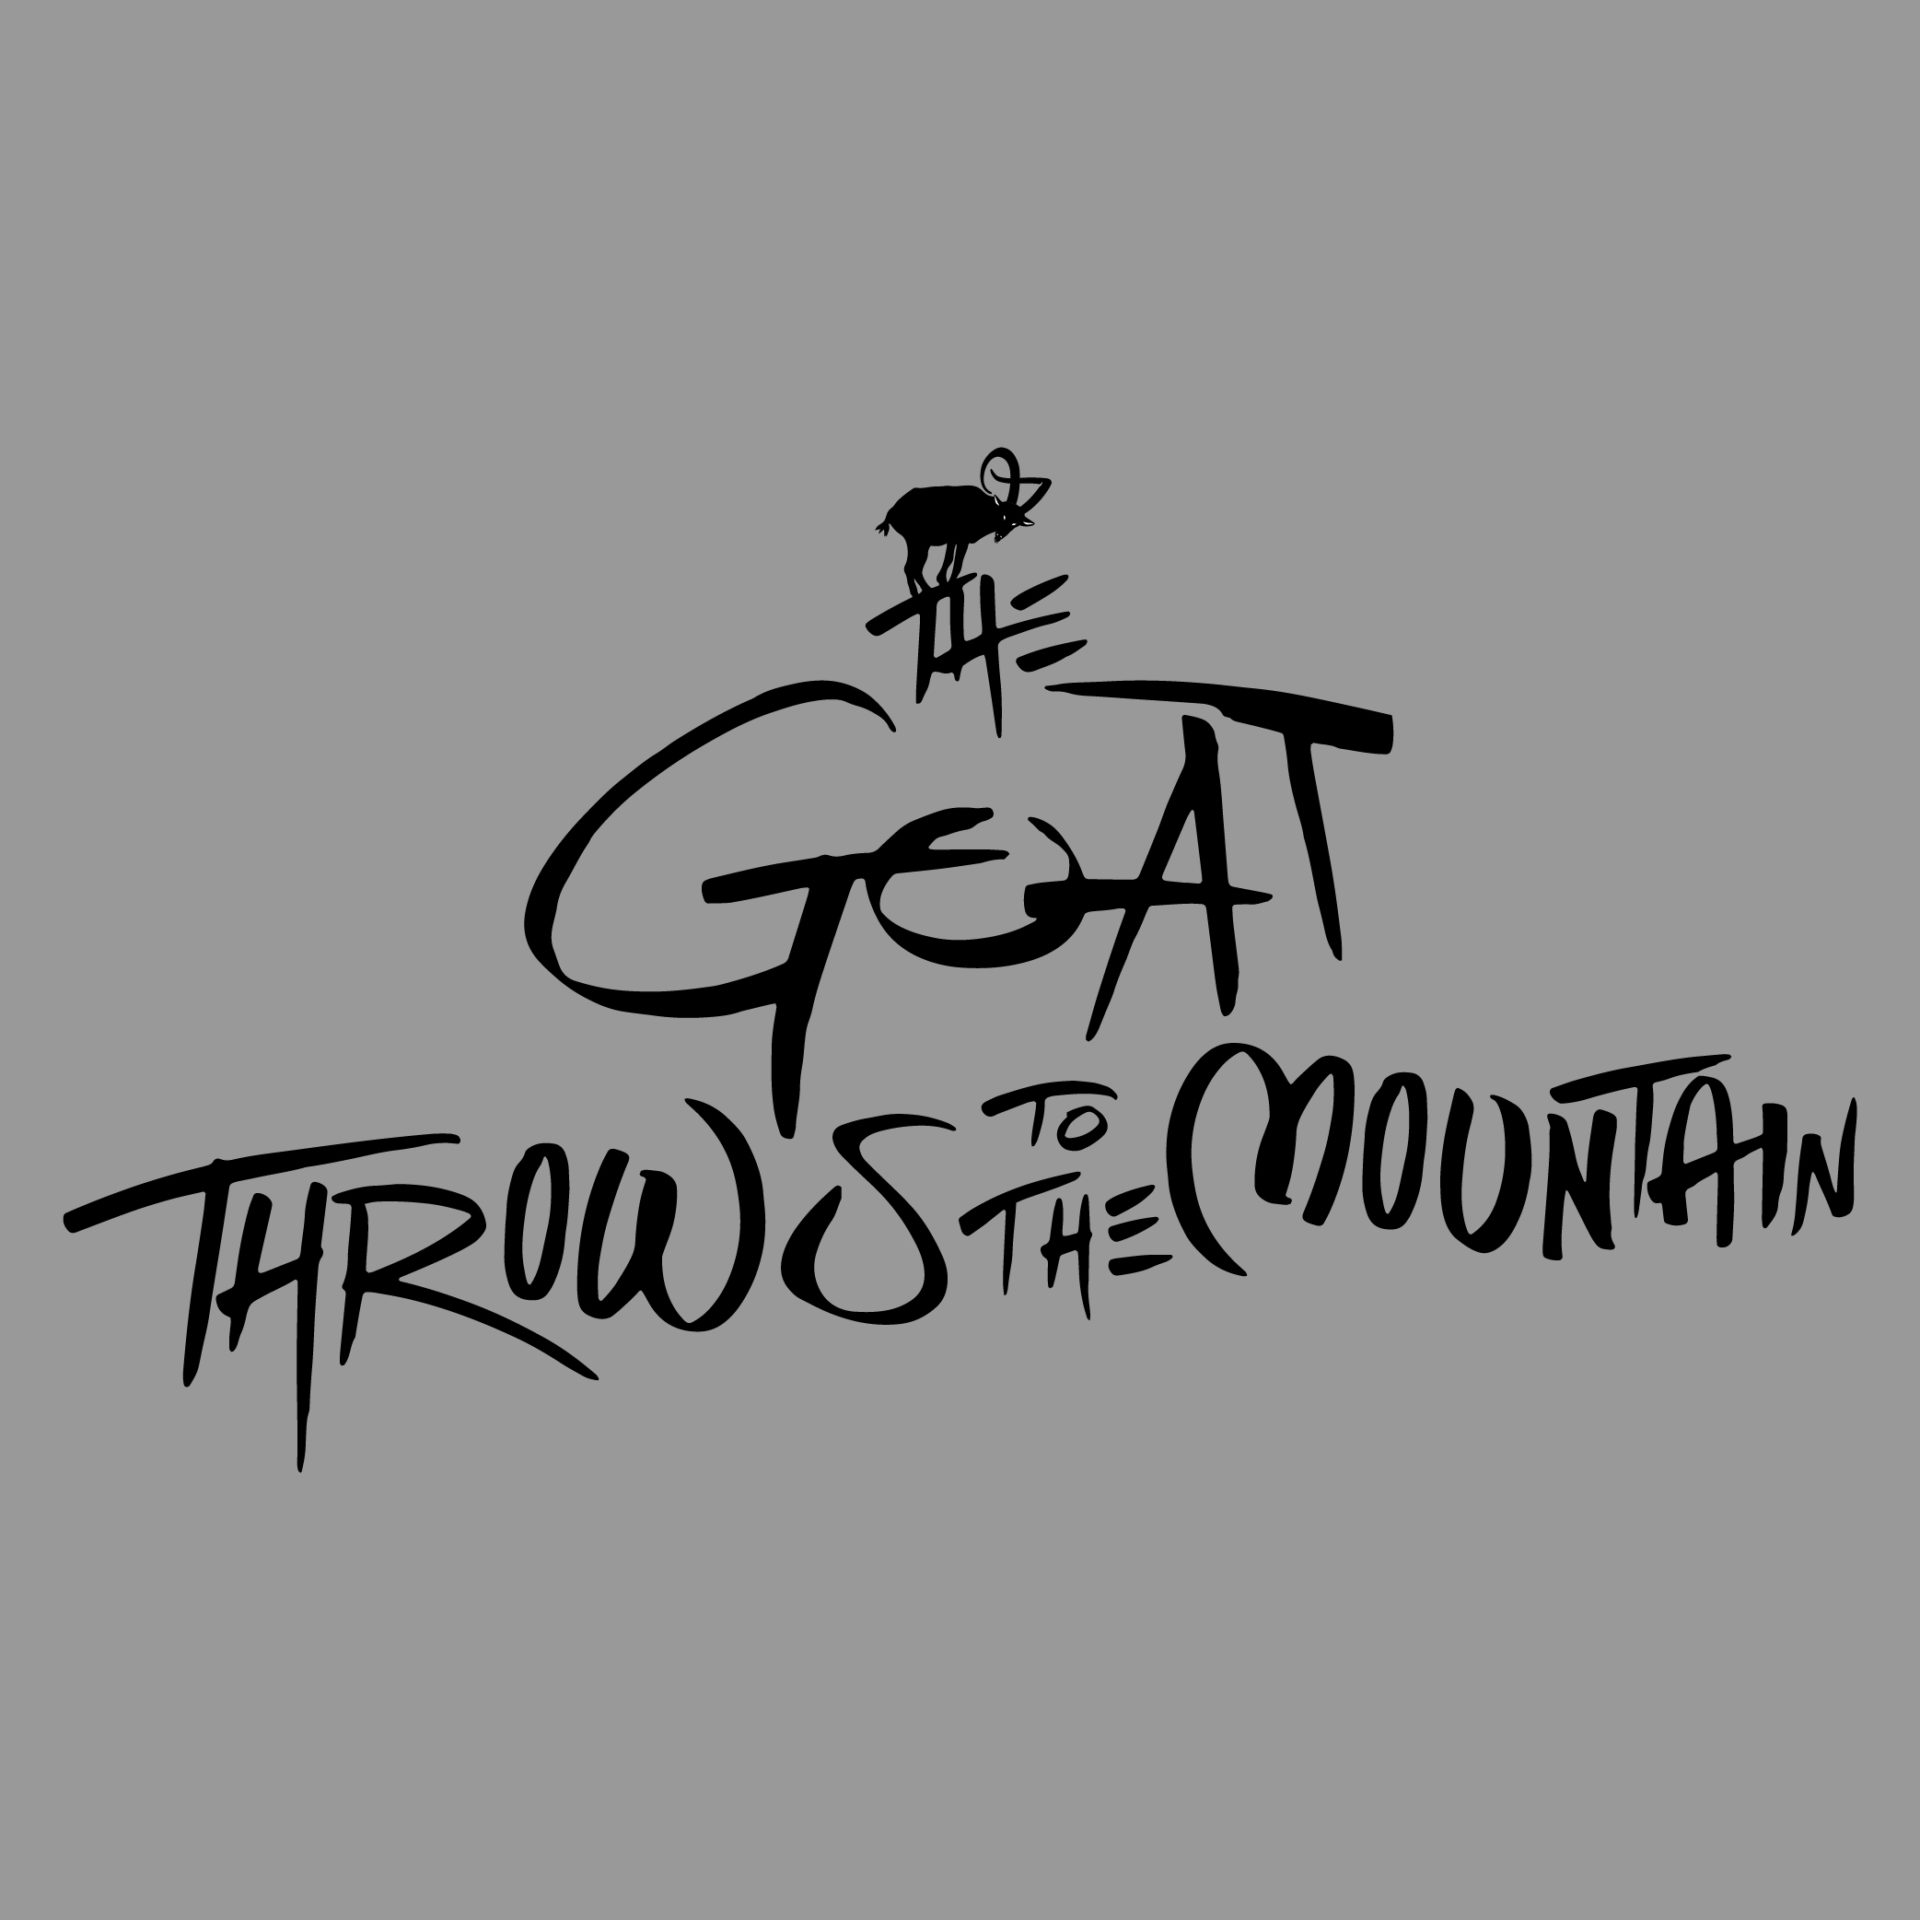 THE GOAT THROWS TO THE MOUNTAIN